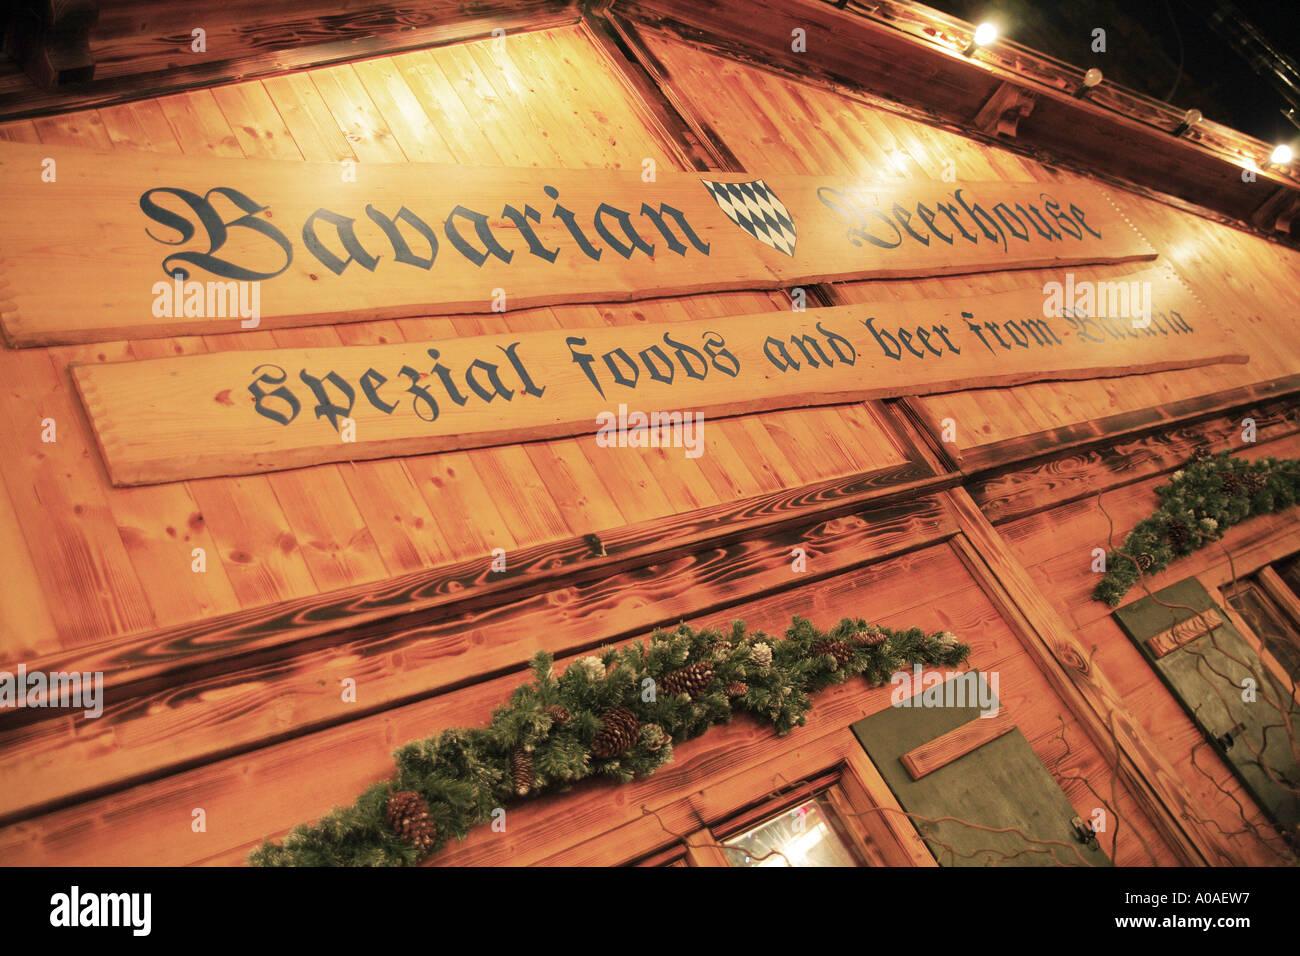 Bavarian Beerhouse at Albert Square Manchesters Christmas Markets UK Stock Photo